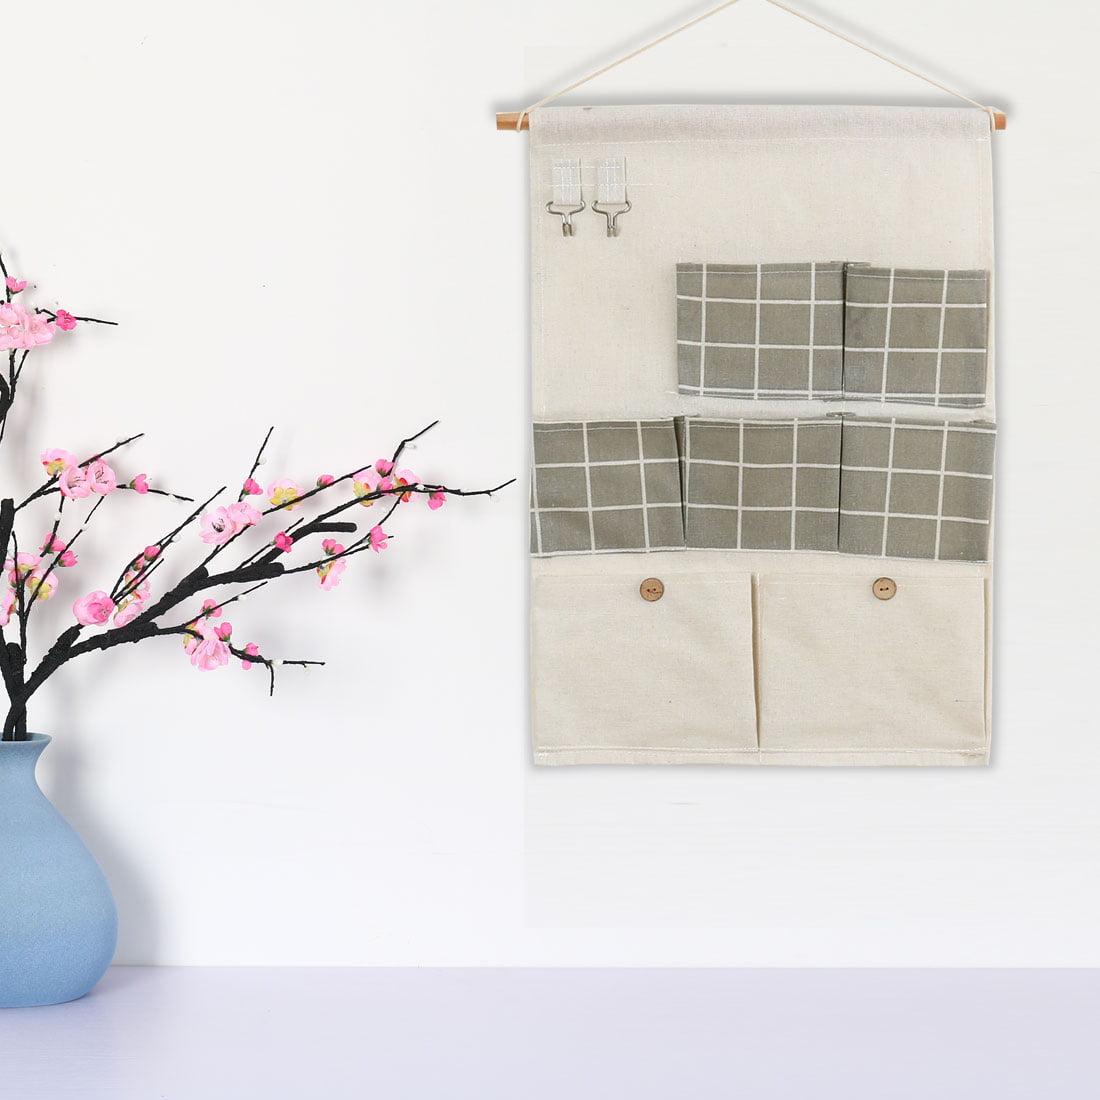 "Closet Foldable Hanging Storage Bag 19.5"" x 13.6"" Organizer Gray Square Pattern - image 6 de 7"